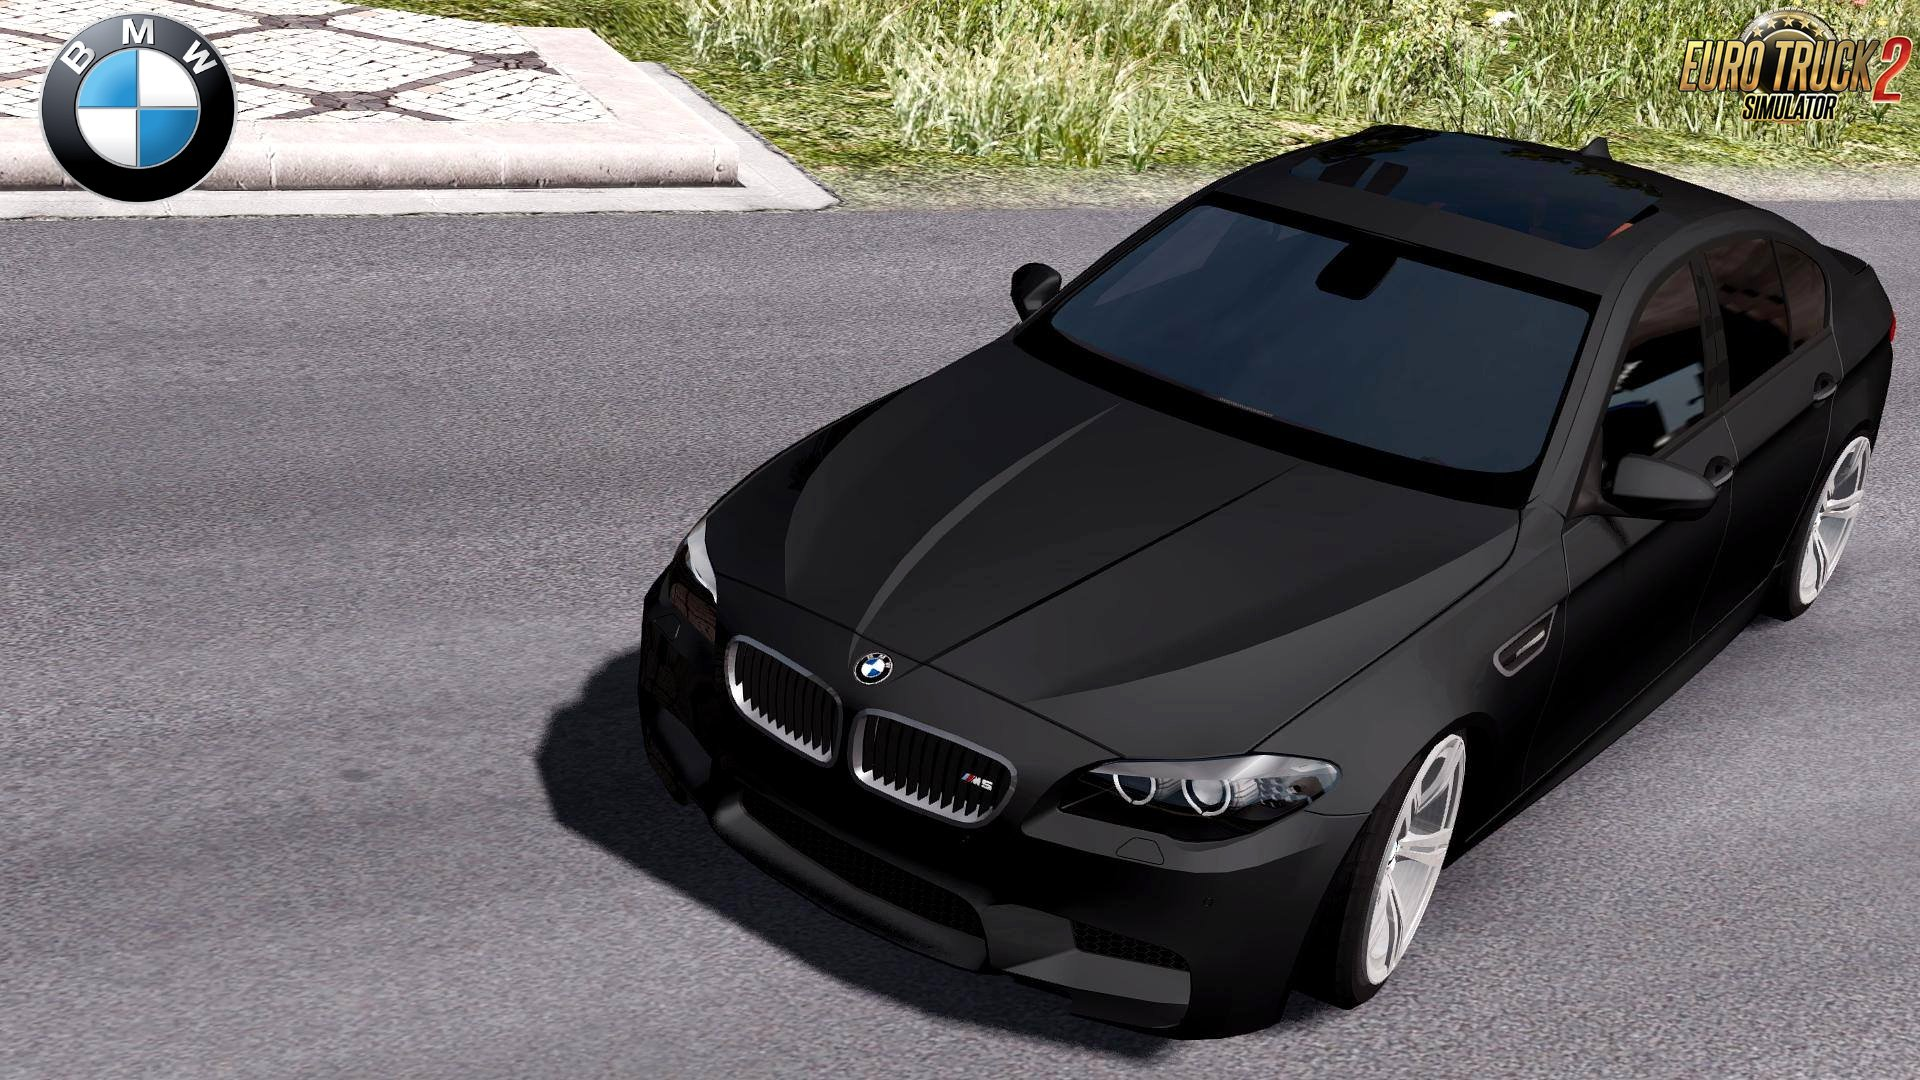 BMW M5 F10 + Interior v3.0 (Update + Fix) (1.31.x)